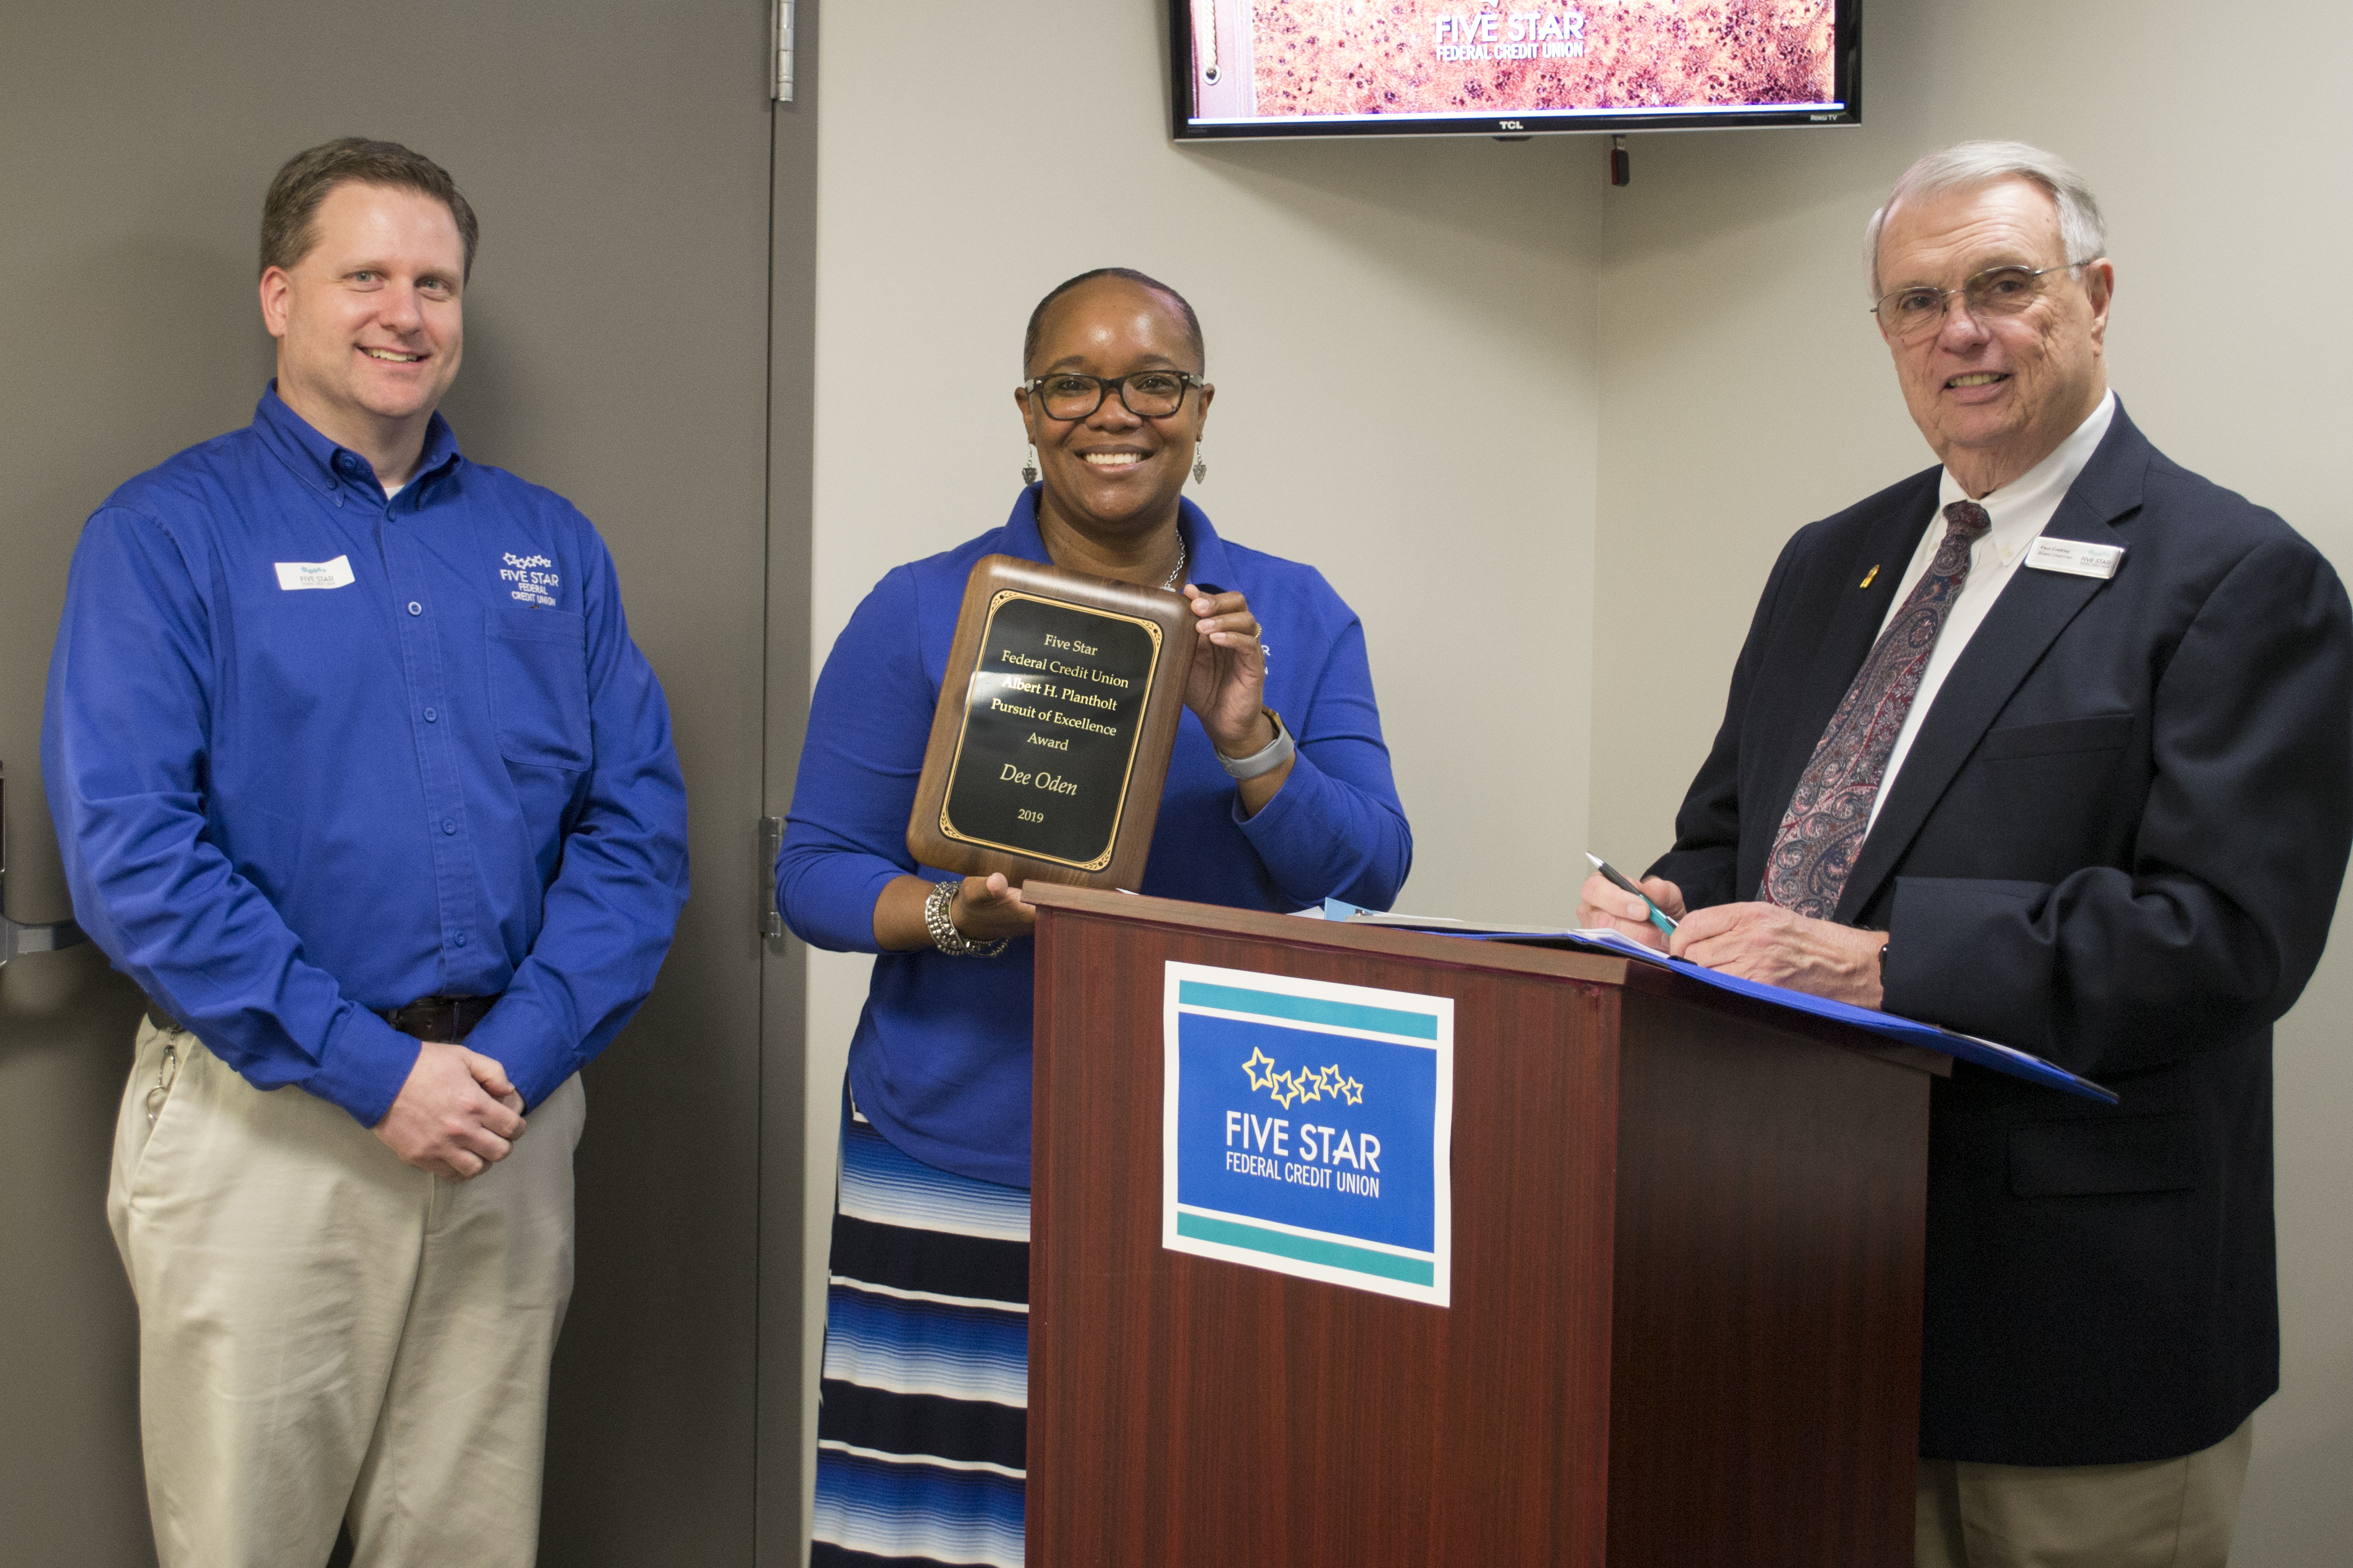 Dee Oden received award